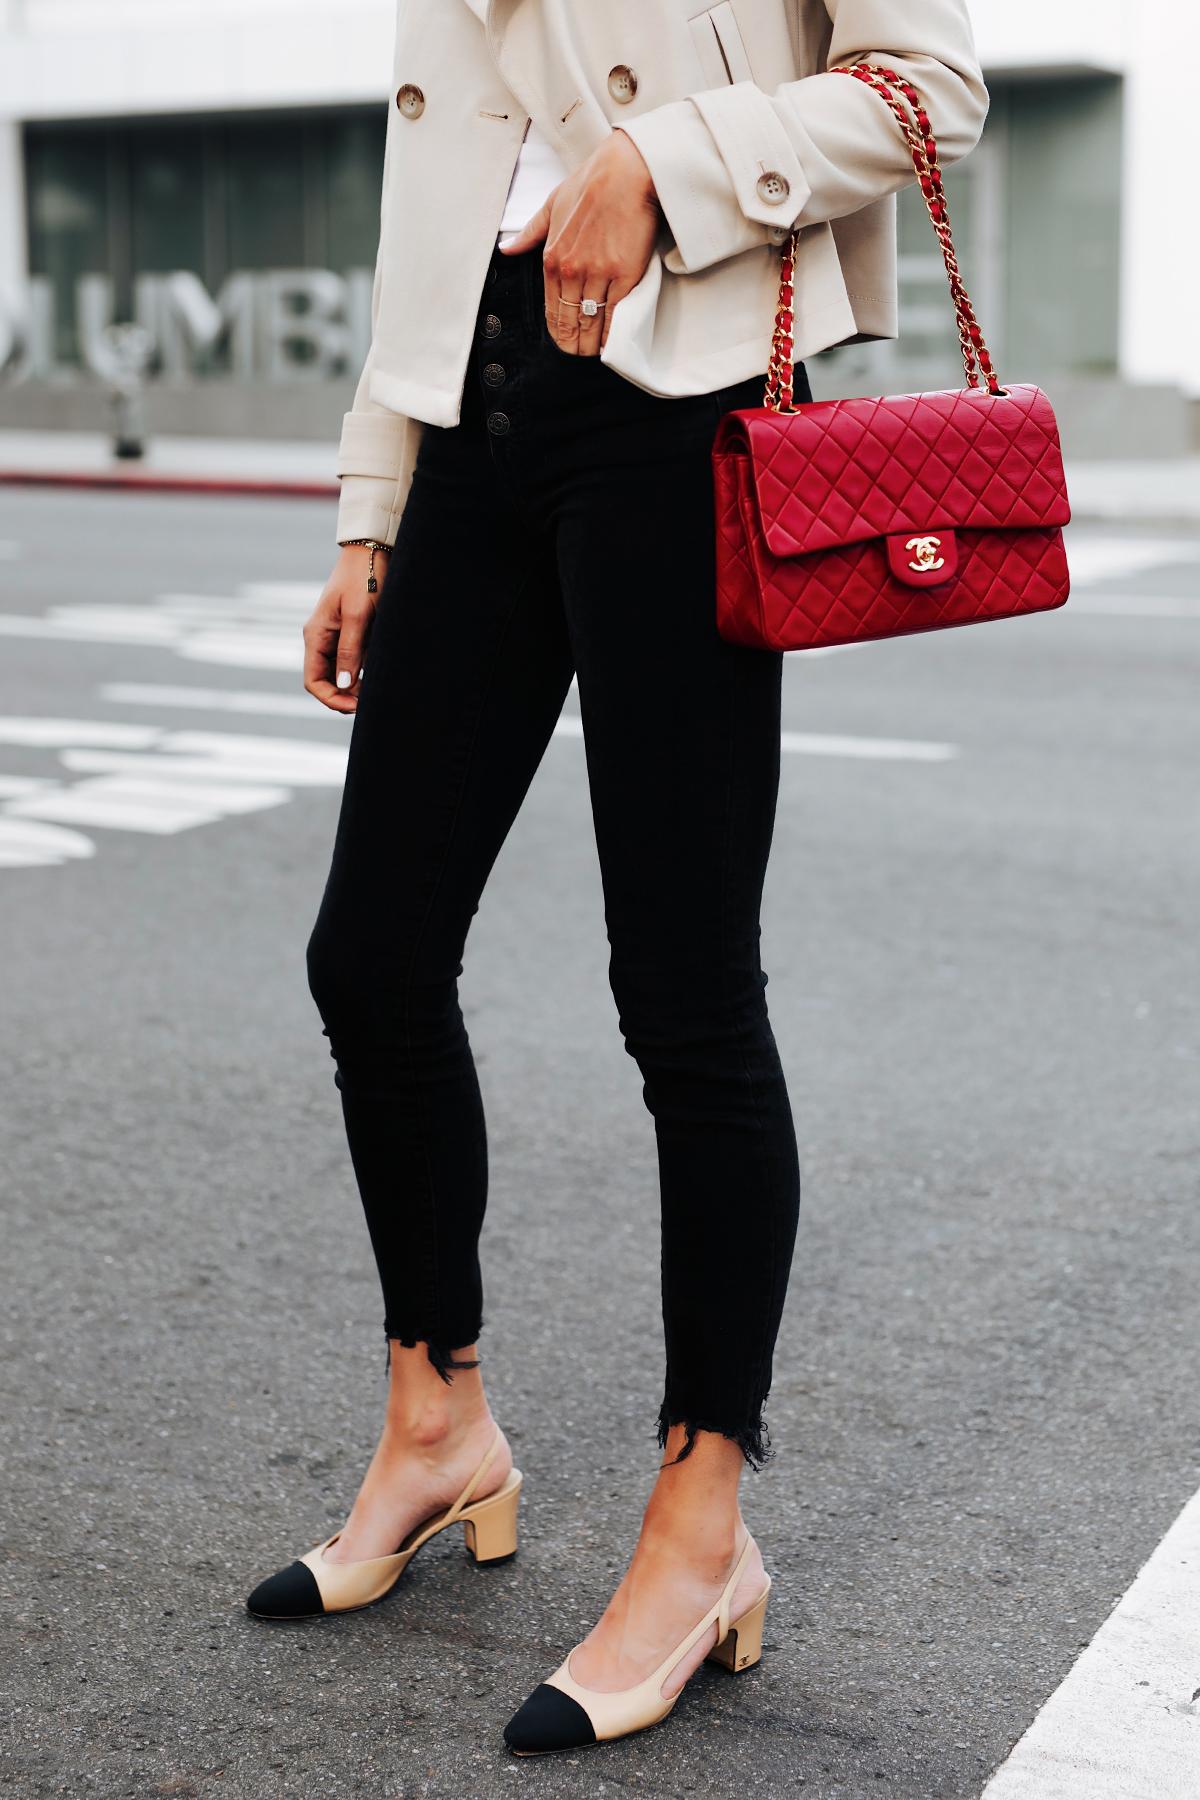 Woman Wearing Trench Coat Black Raw Hem Skinny Jeans Chanel Slingbacks Red Chanel Classic Handbag Fashion Jackson San Diego Fashion Blogger Street Style